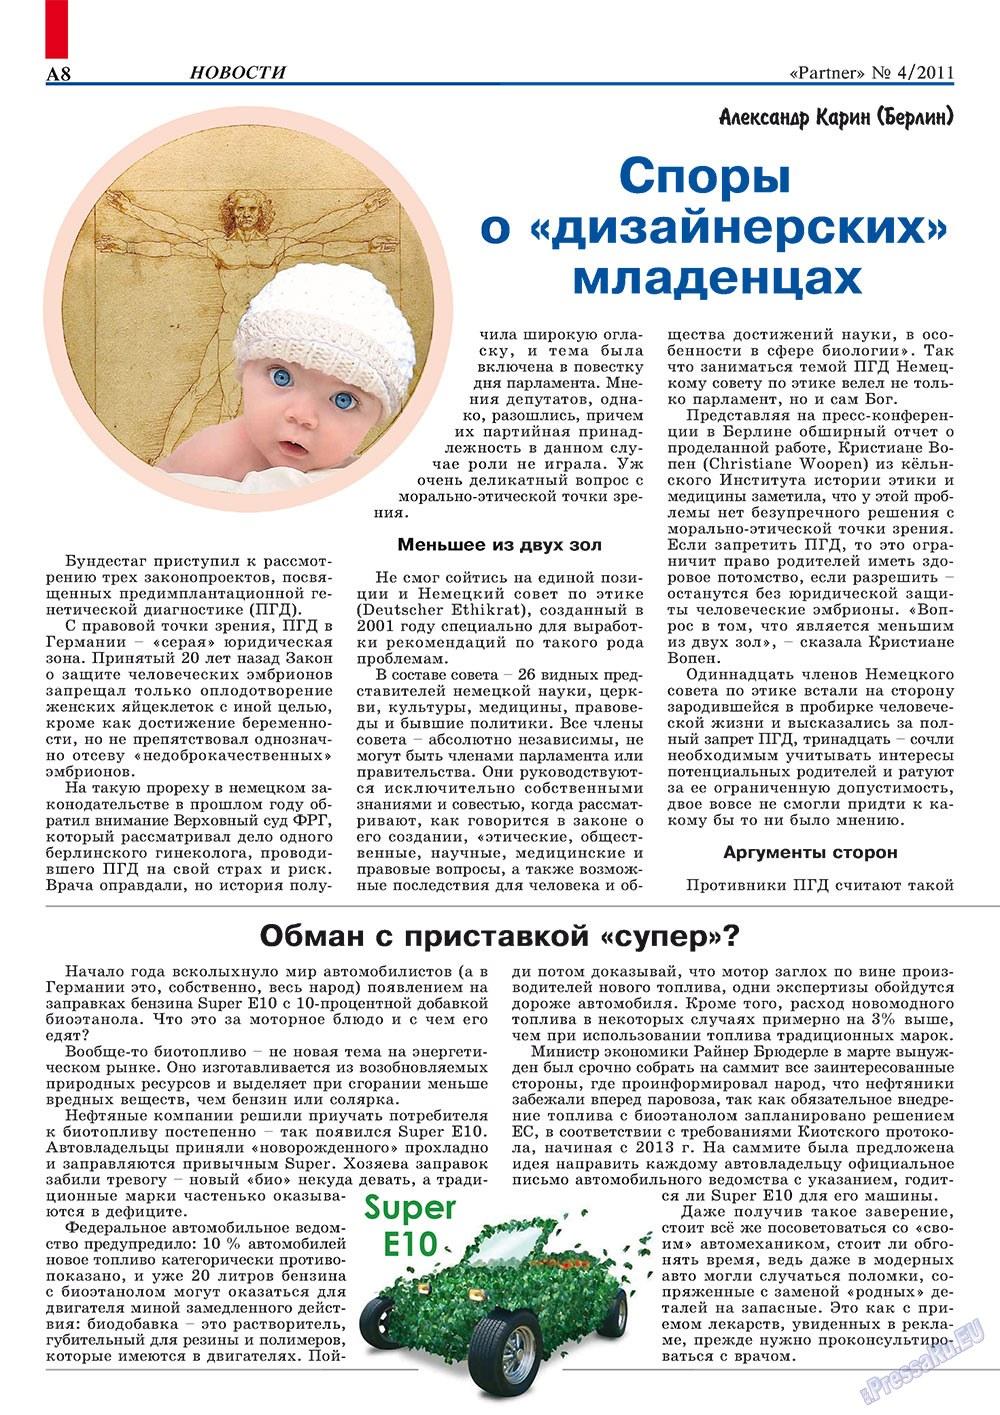 Партнер-север (журнал). 2011 год, номер 4, стр. 8